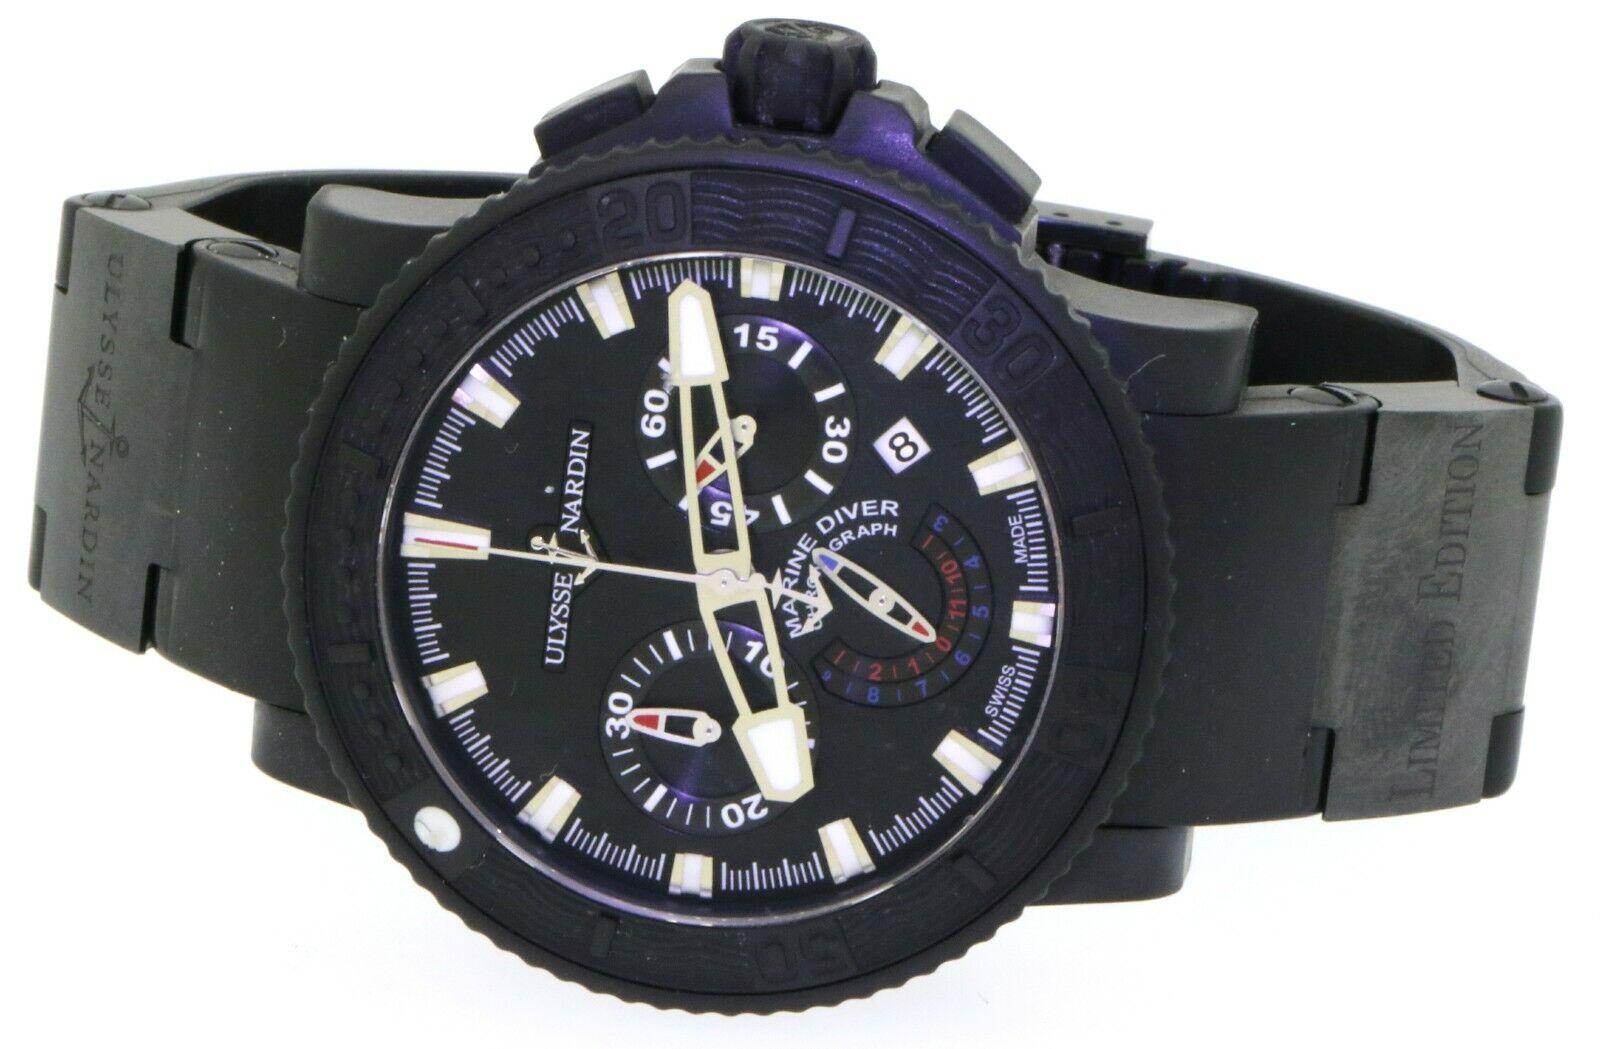 Ulysse Nardin Black Sea Marine Diver 353-92 PVD 45mm auto. chrono. men's watch - watch picture 1